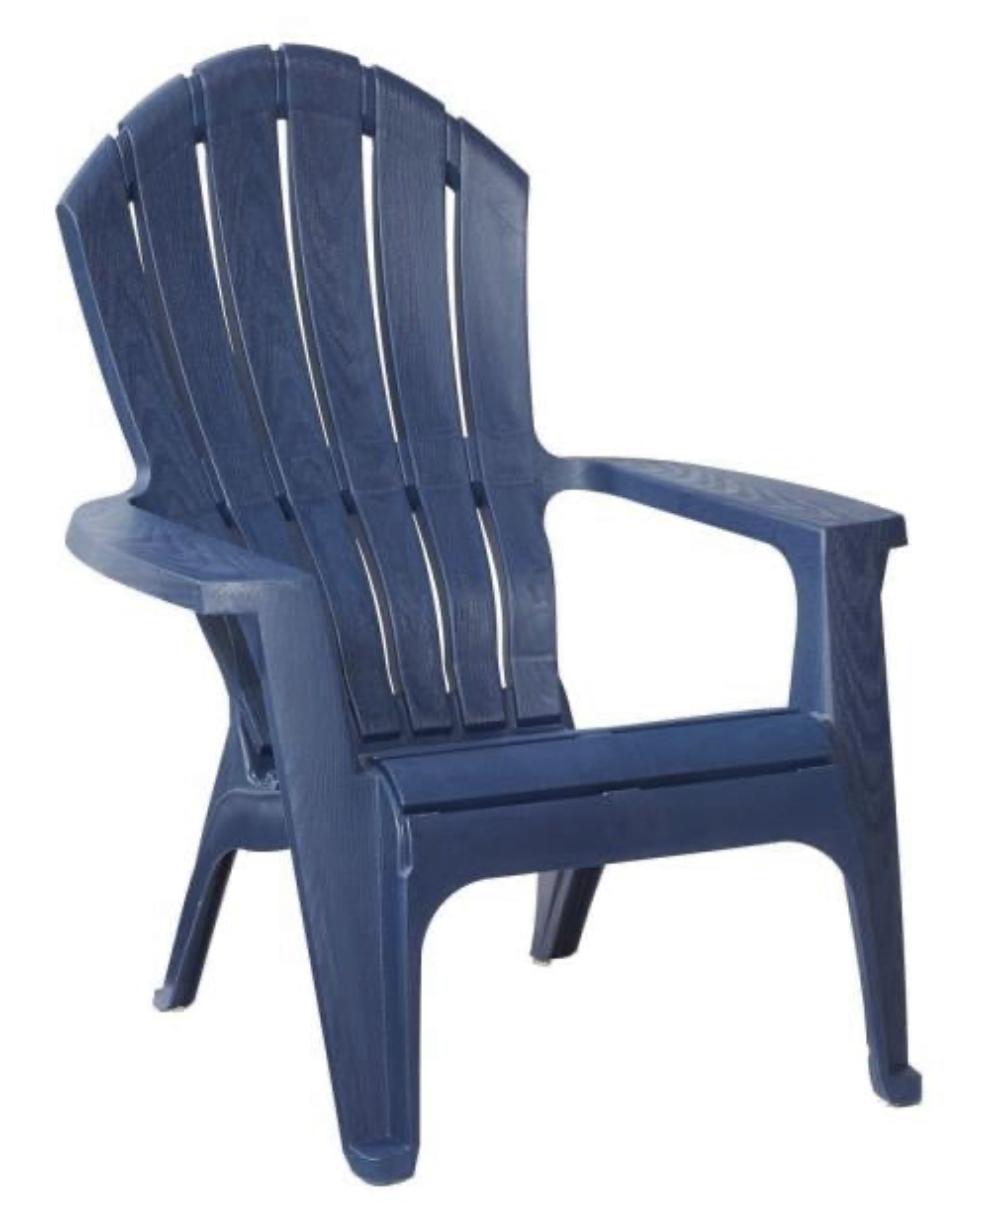 Home Depot Adirondack chair